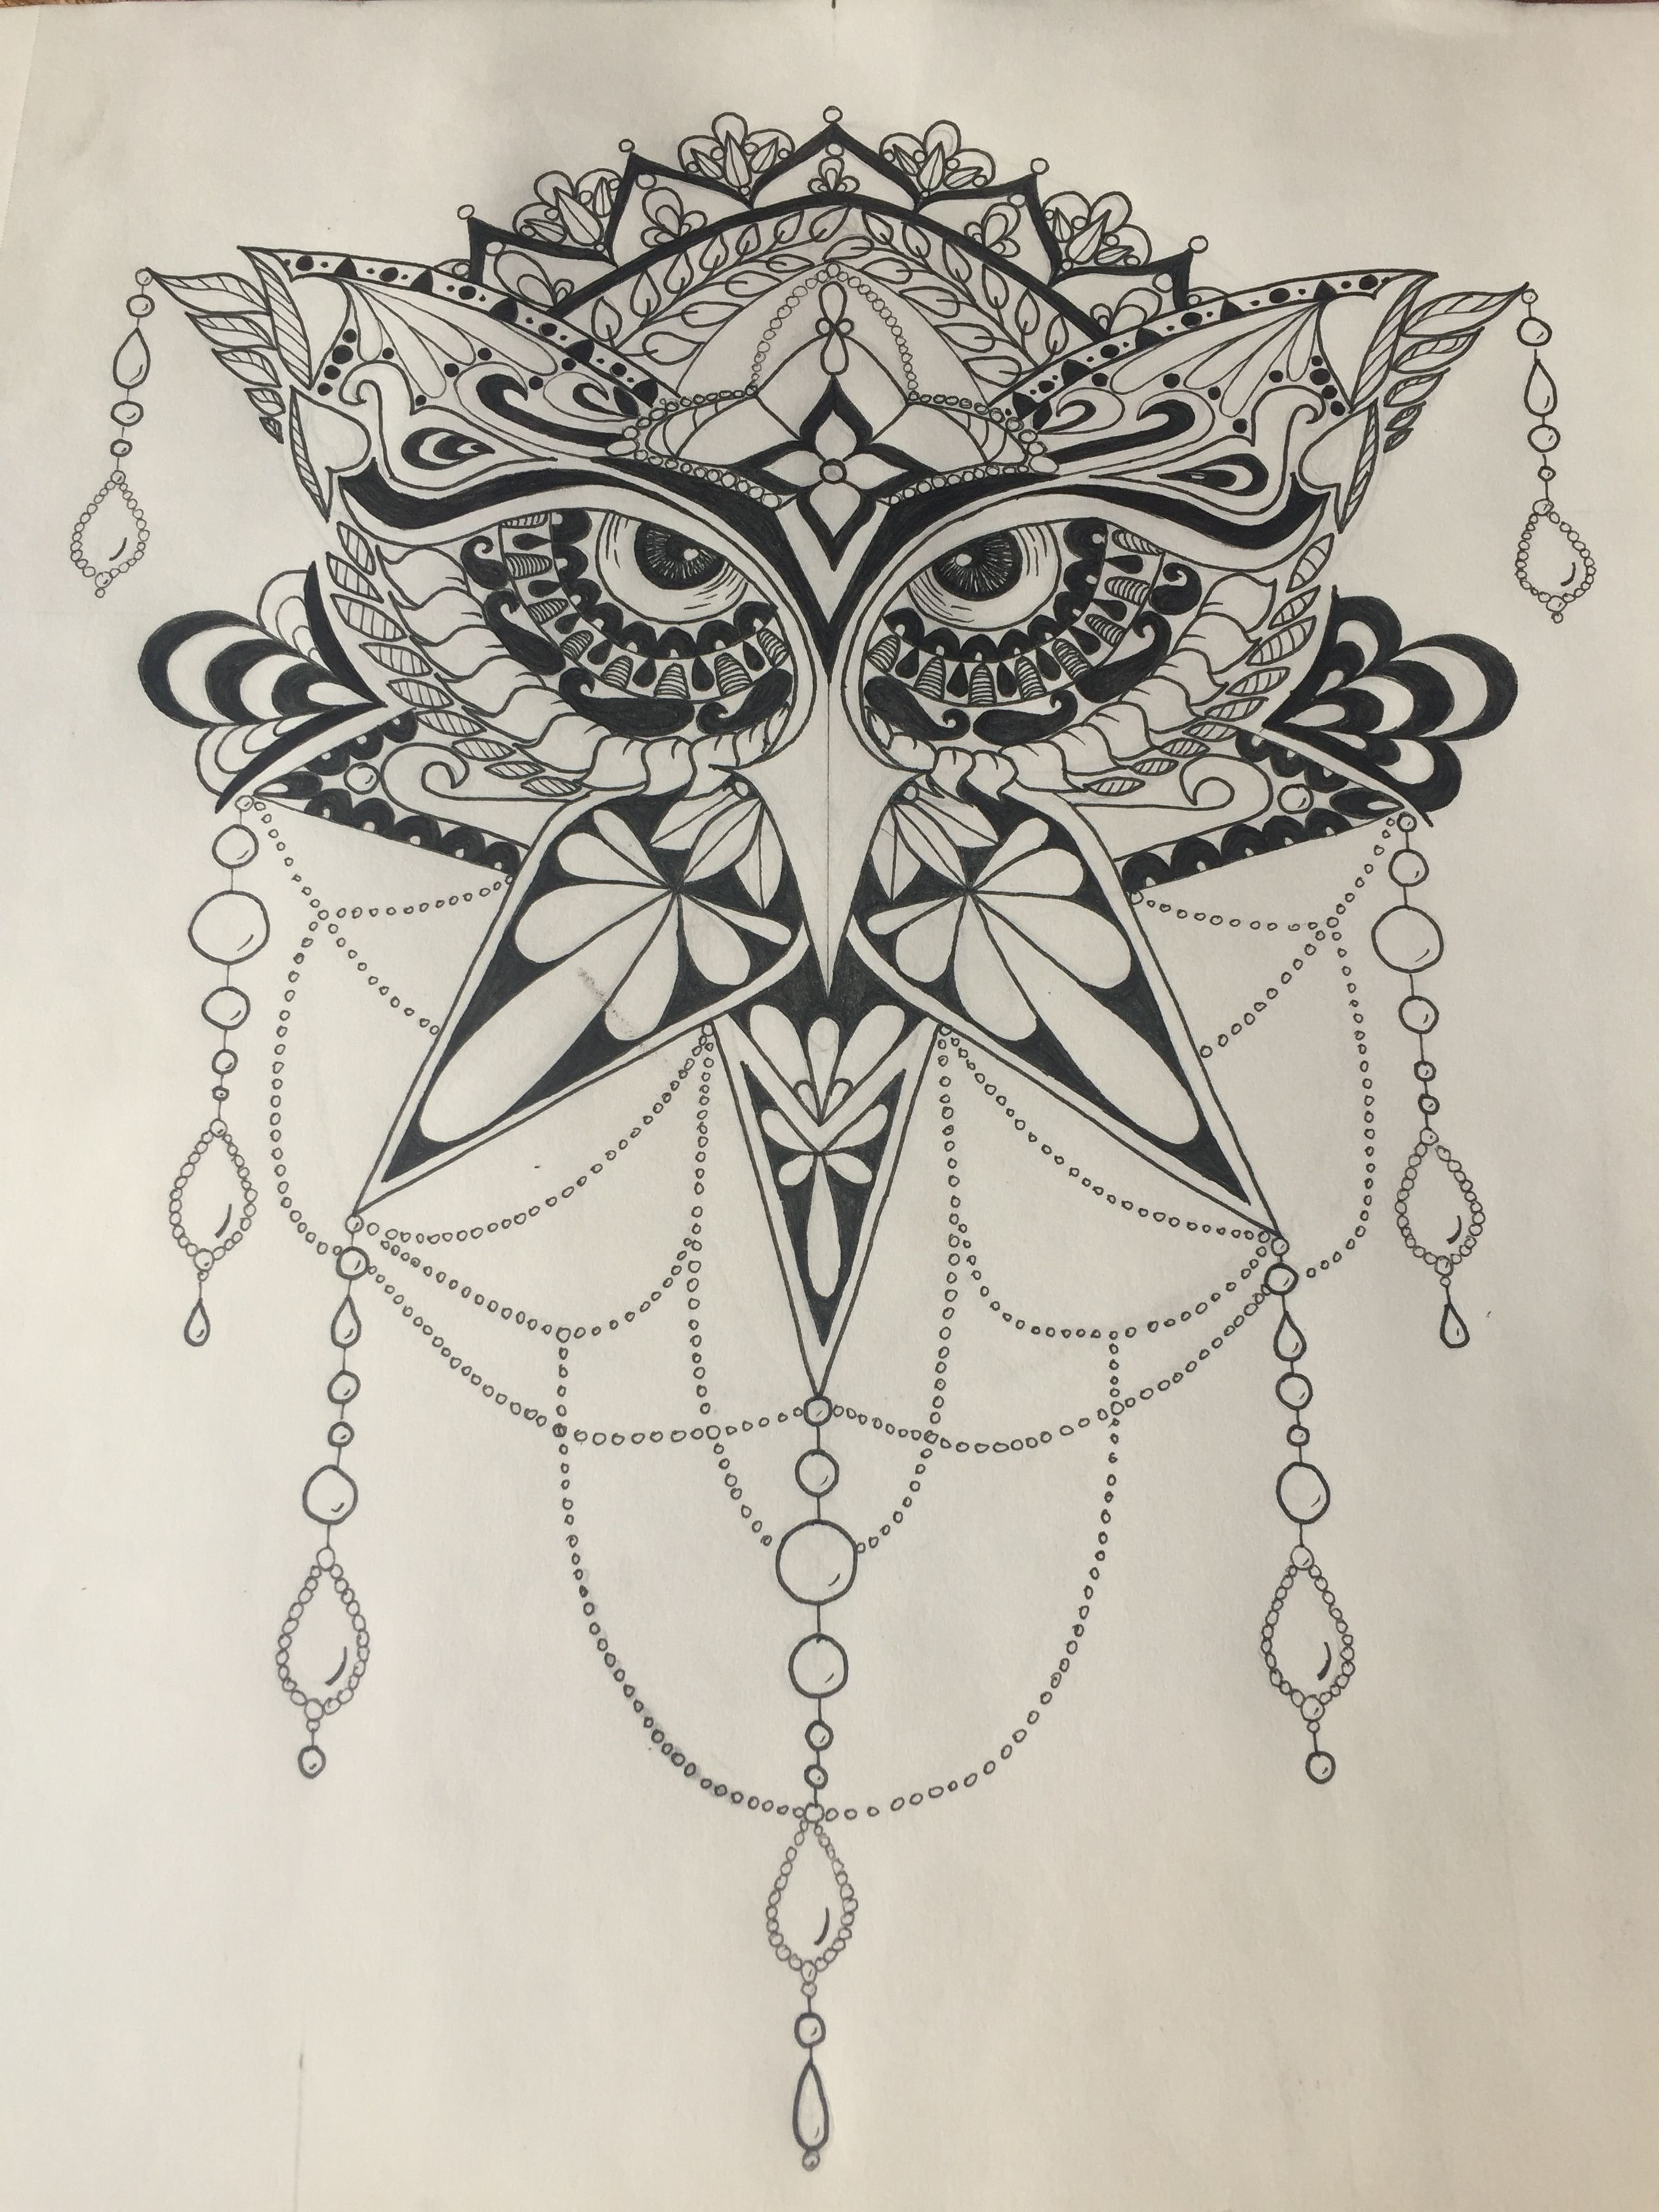 Buho Tatuaje Mandala owl, pen art, black and white, mandala style, tattoo or ink